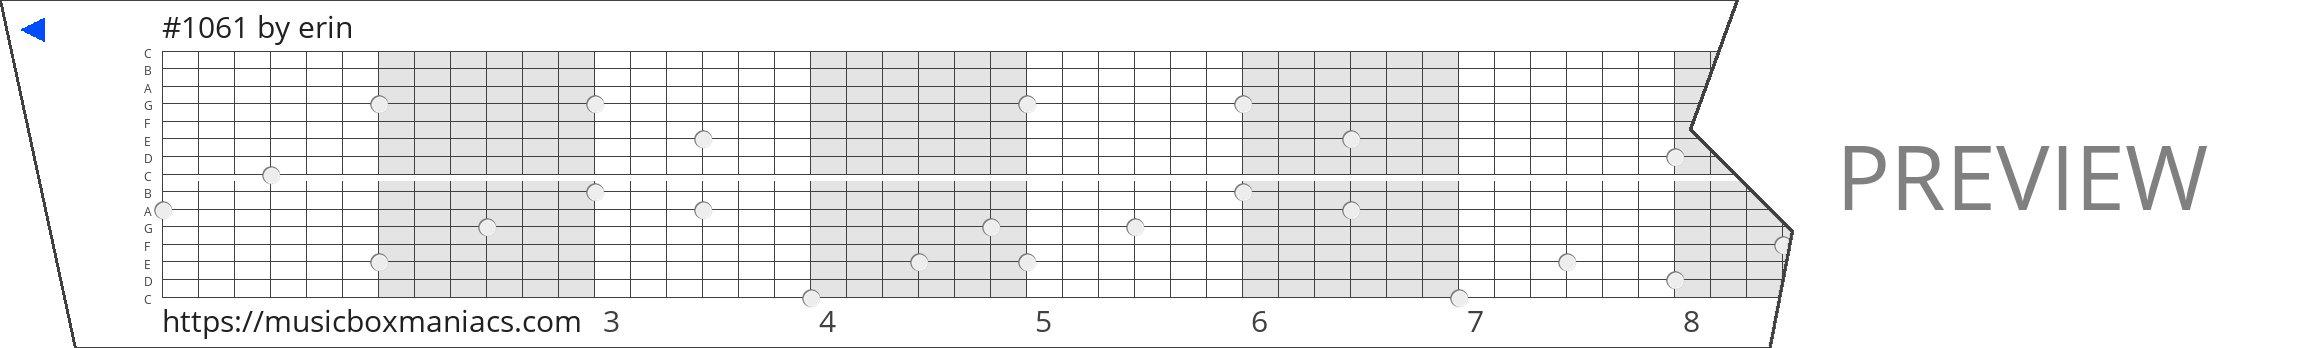 #1061 15 note music box paper strip